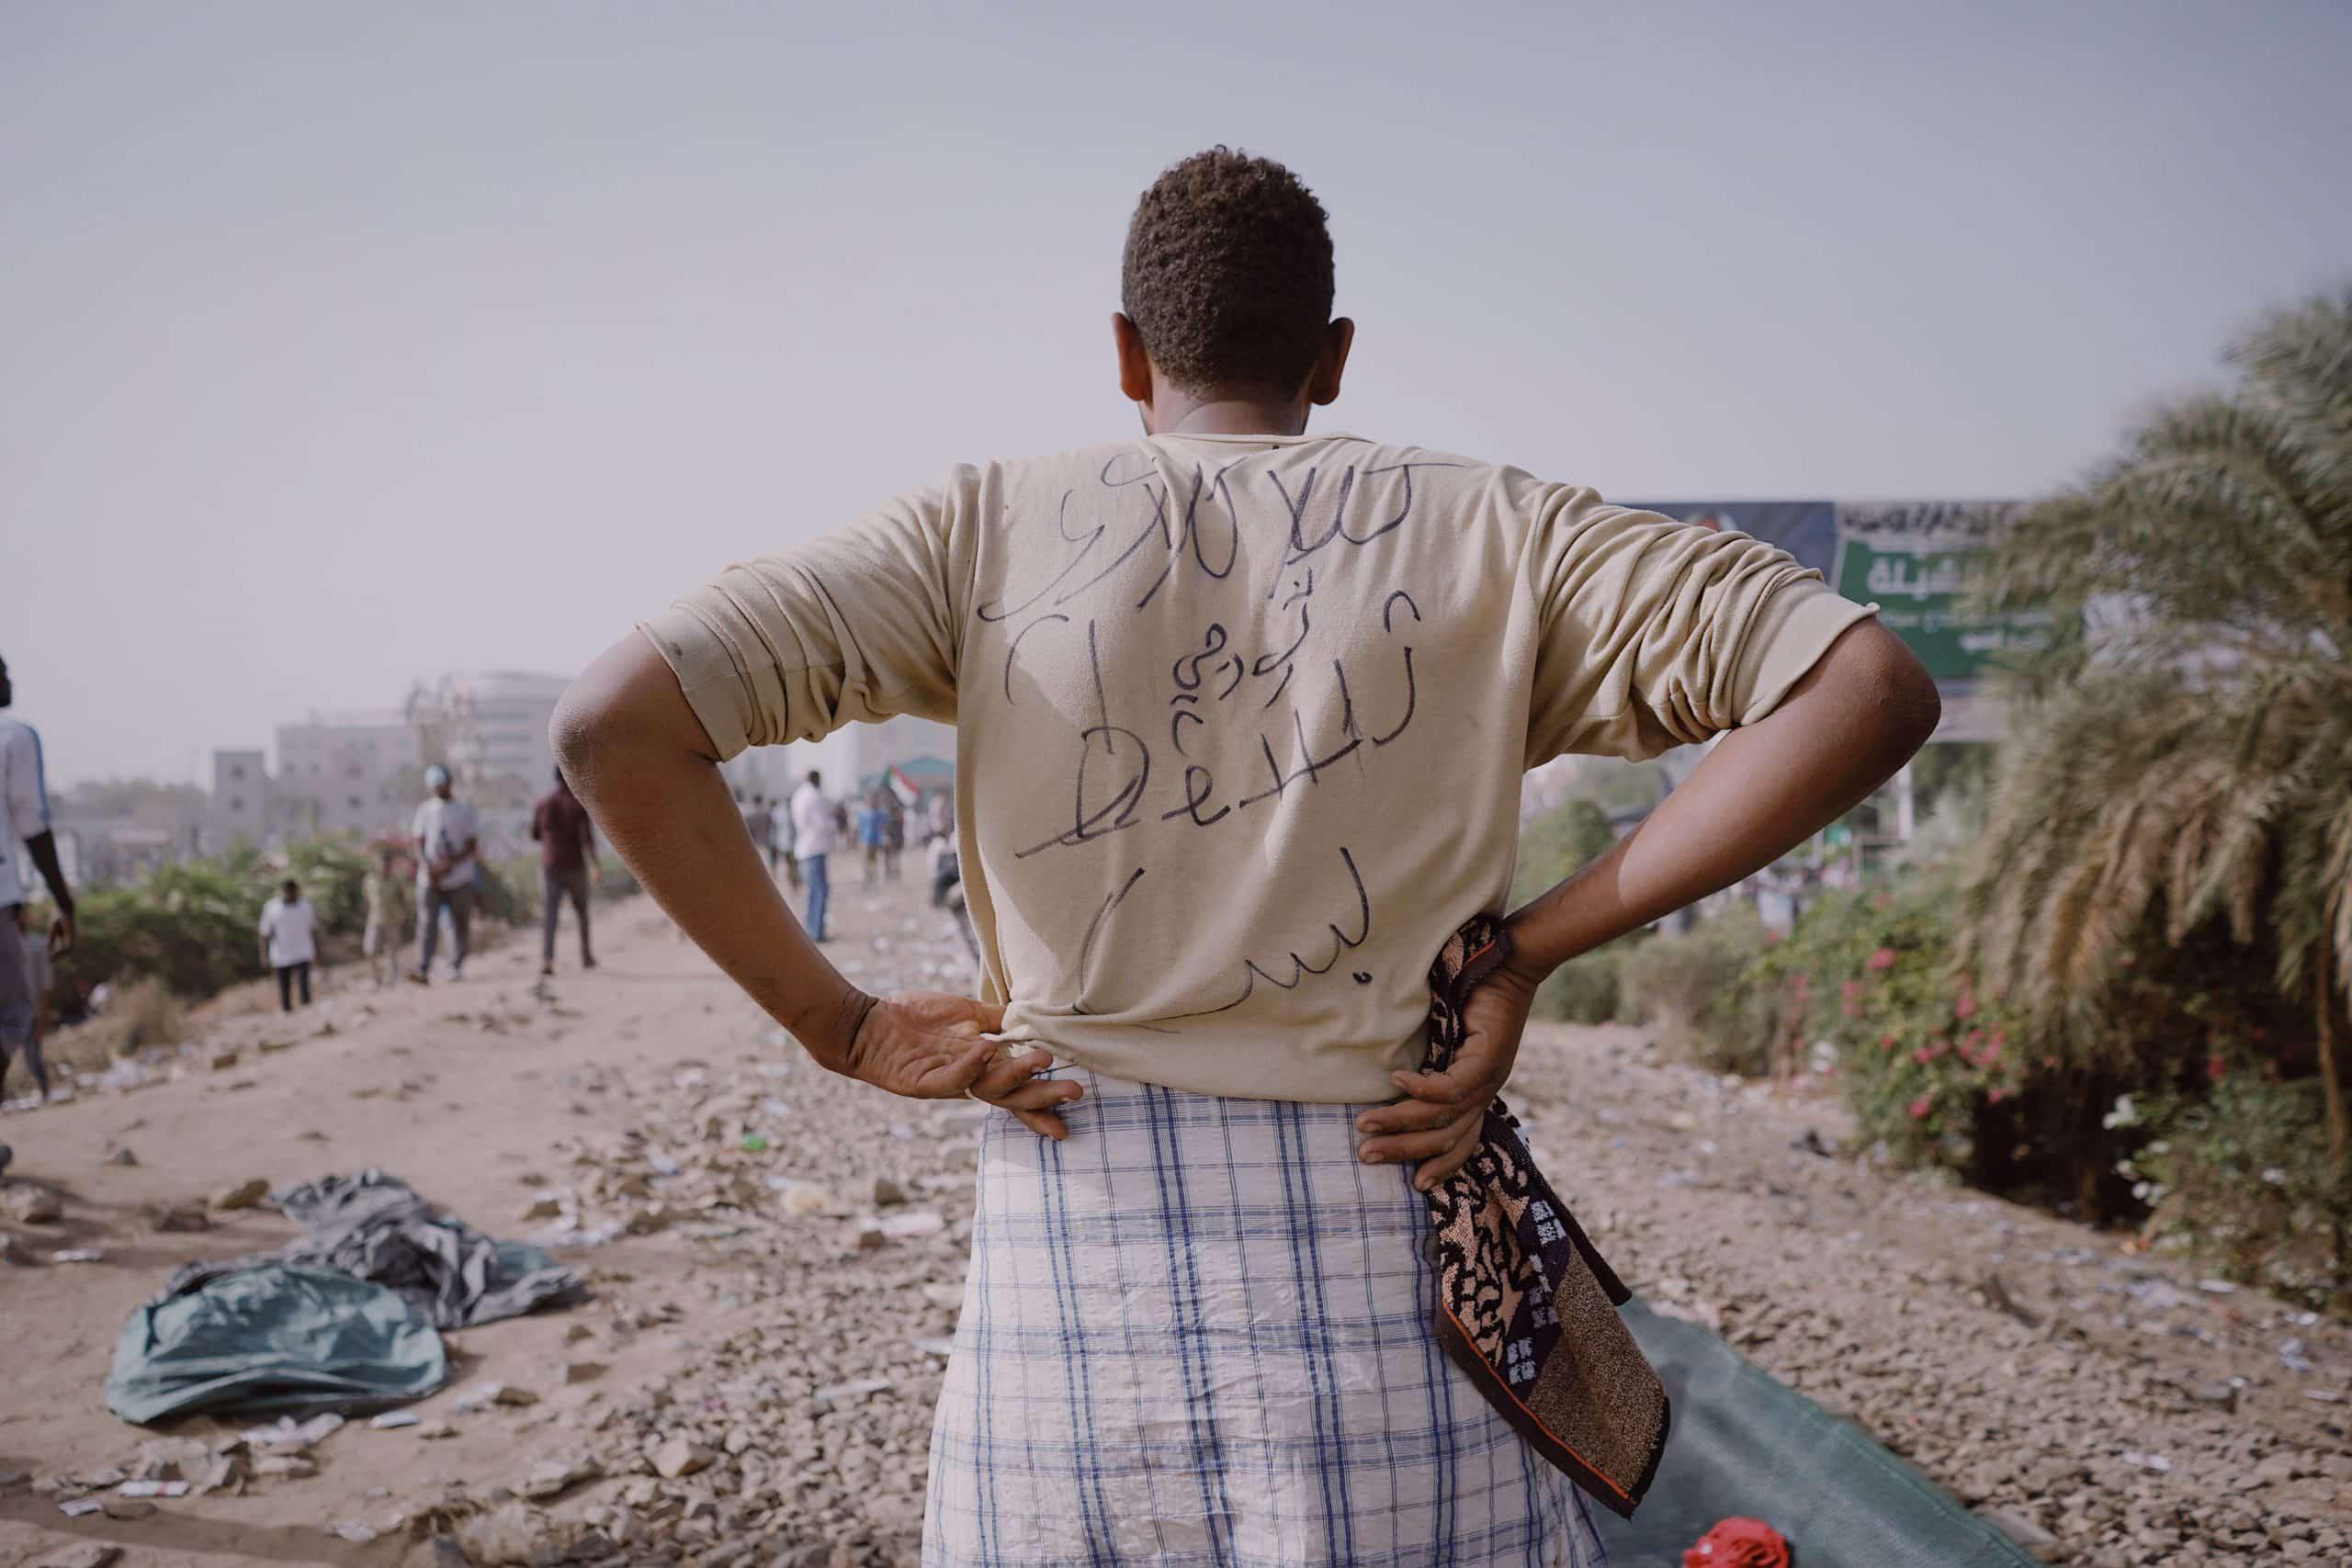 Sudnly-mag-Les Rencontres d'Arles 2021-Khartoum, Soudan, 13 avril 2019